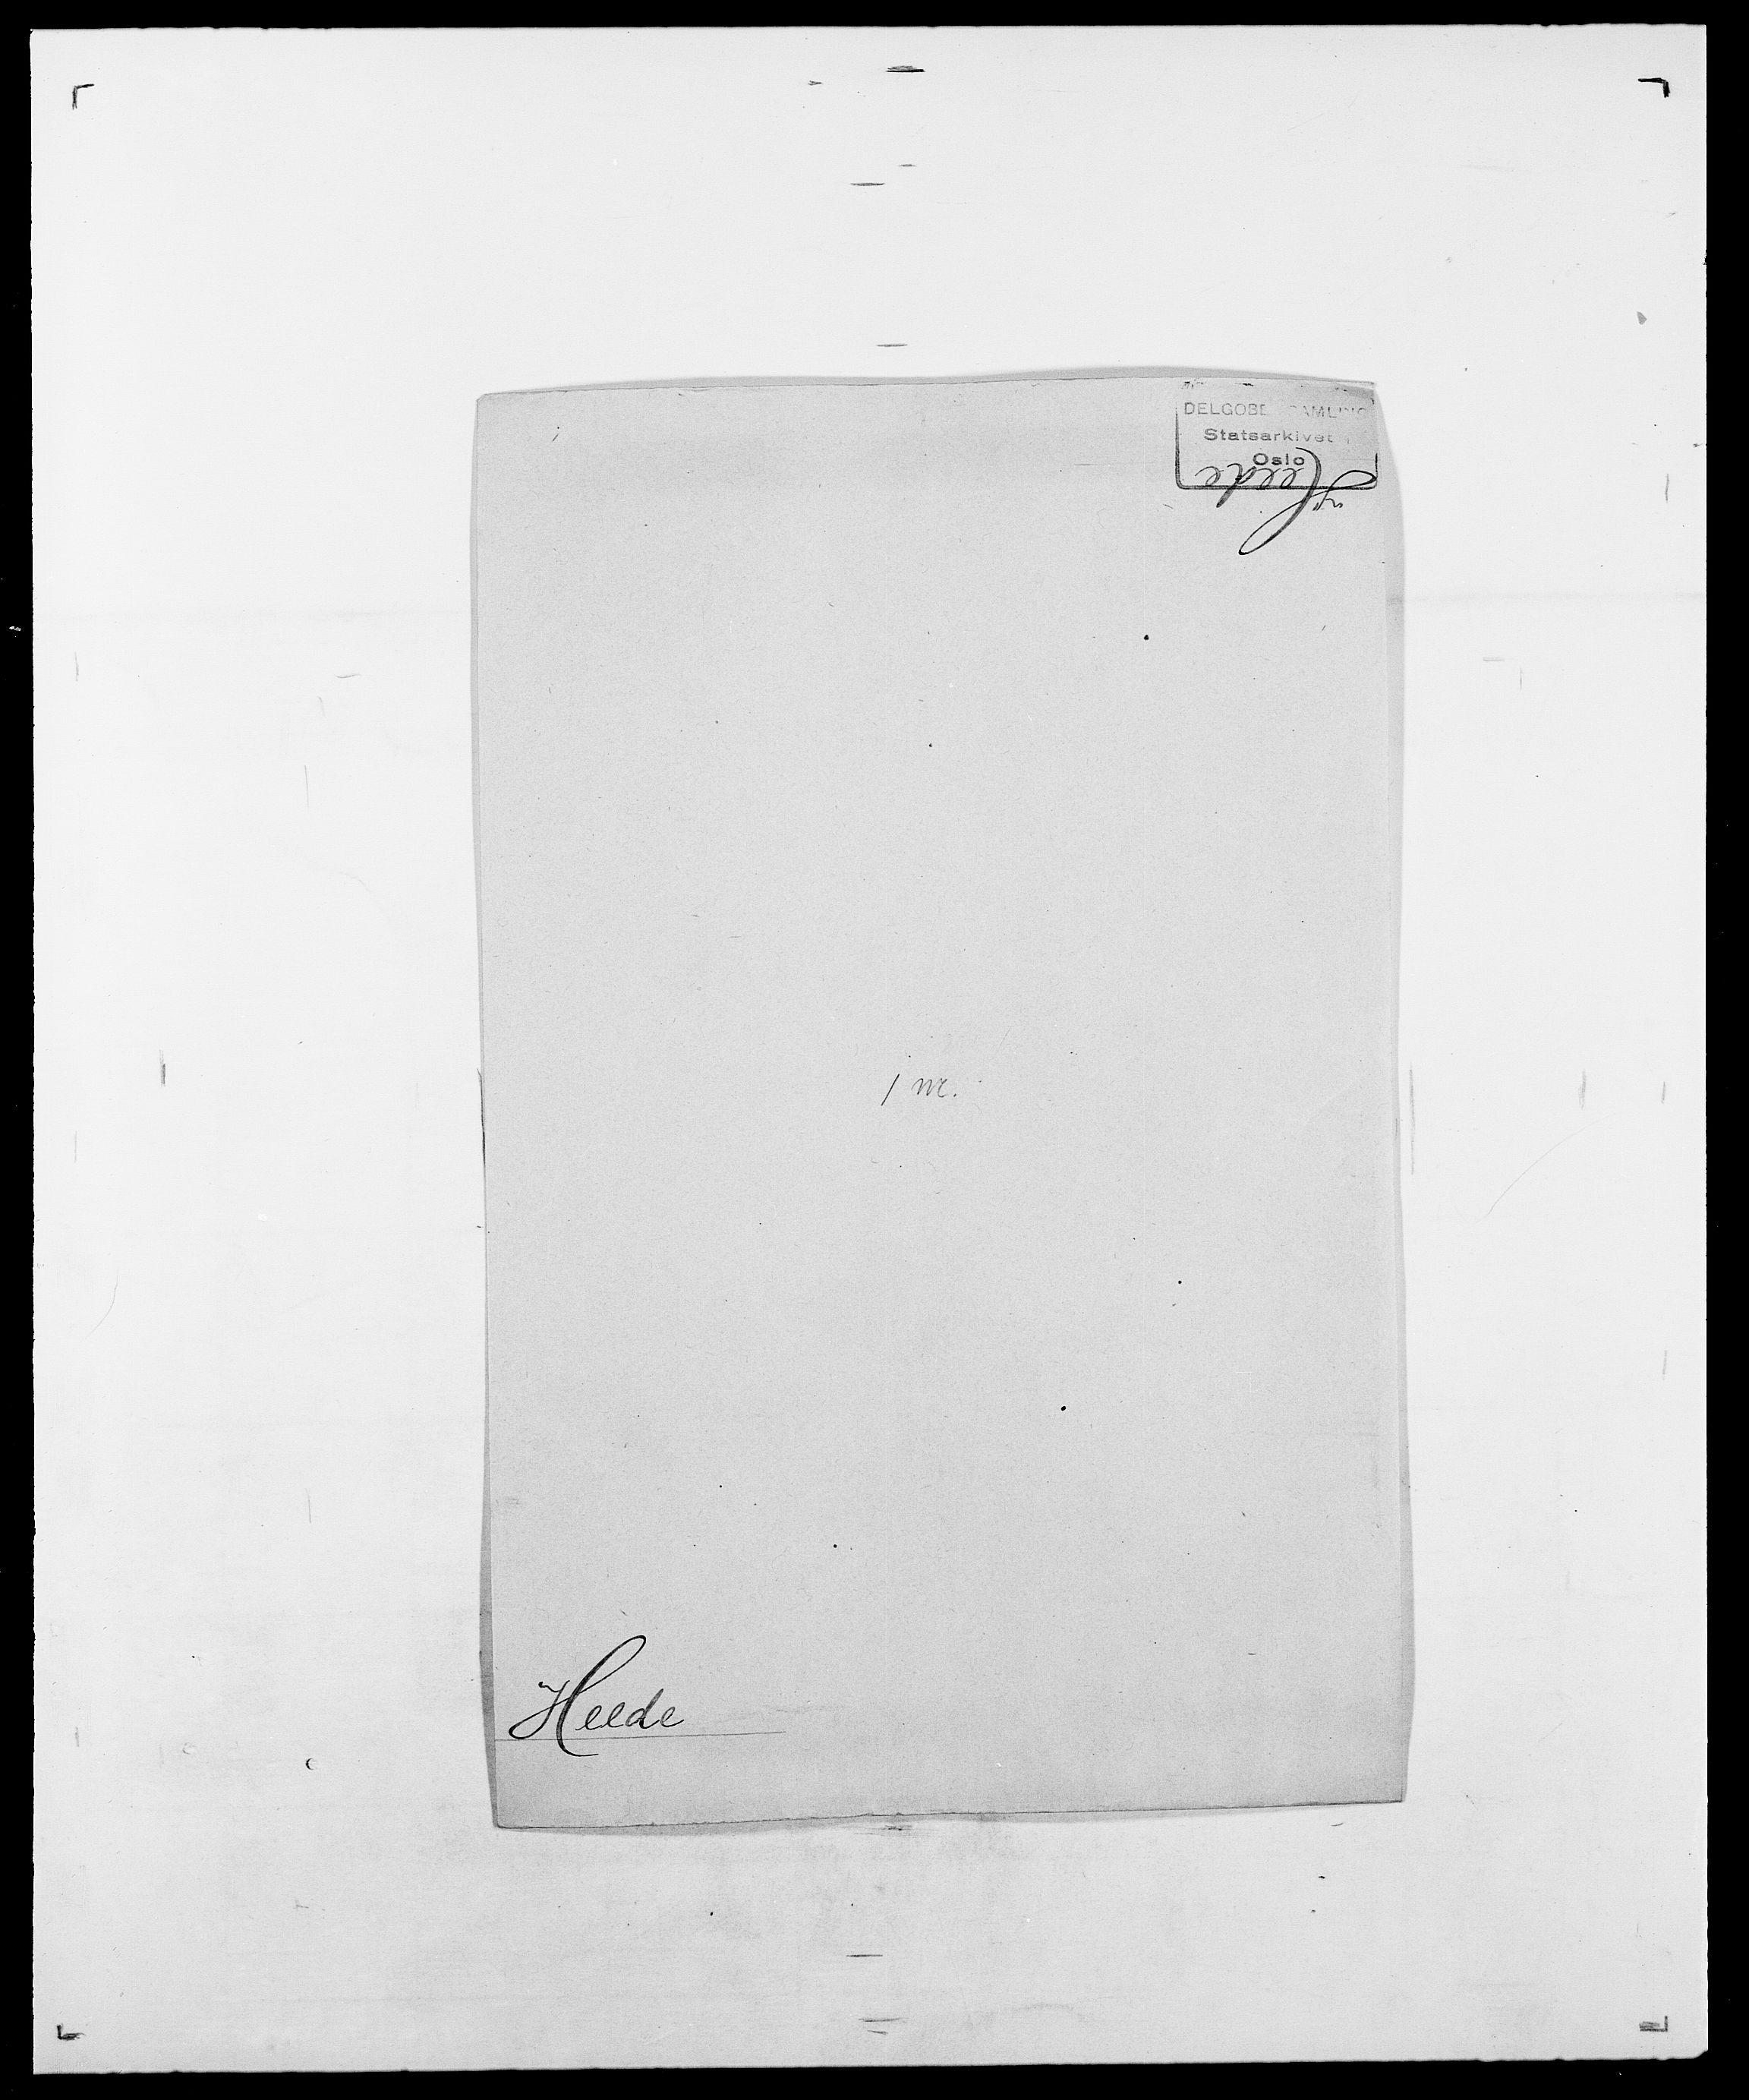 SAO, Delgobe, Charles Antoine - samling, D/Da/L0016: Hamborg - Hektoen, s. 684